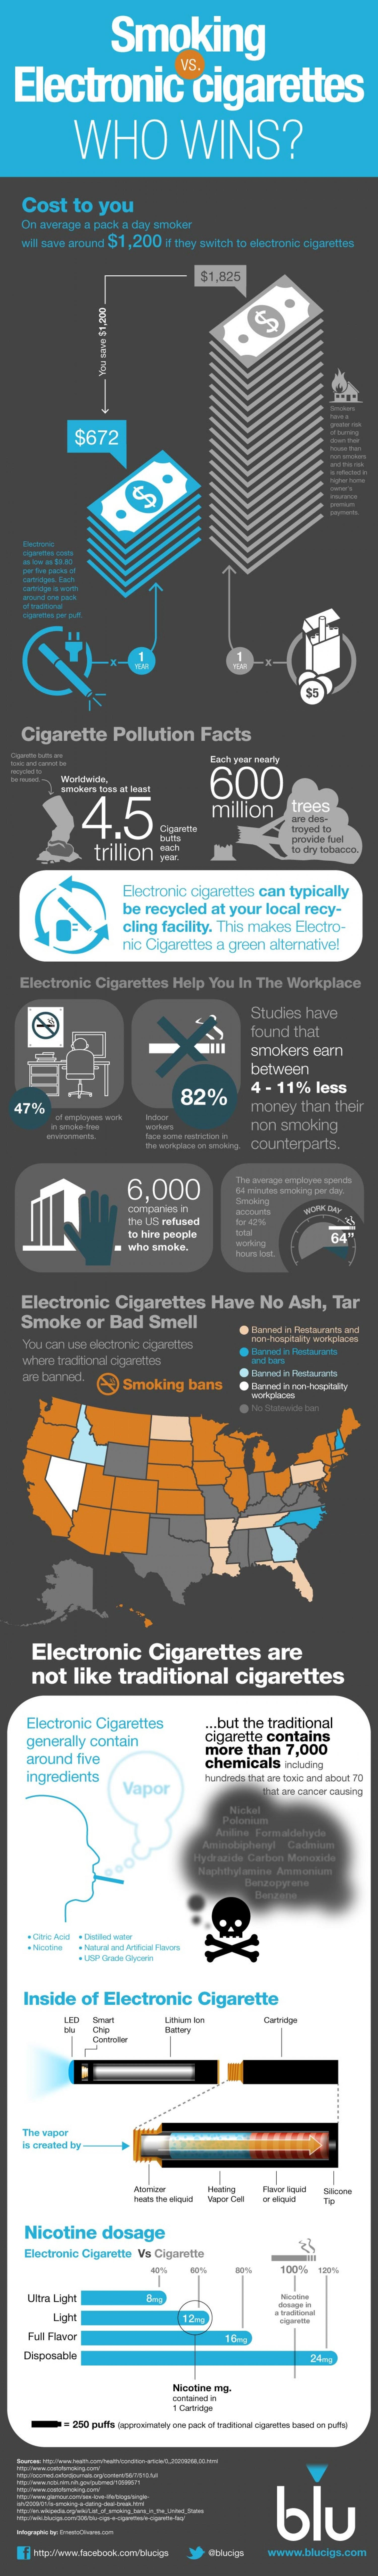 9. Smoking Vs Electronic cigarette